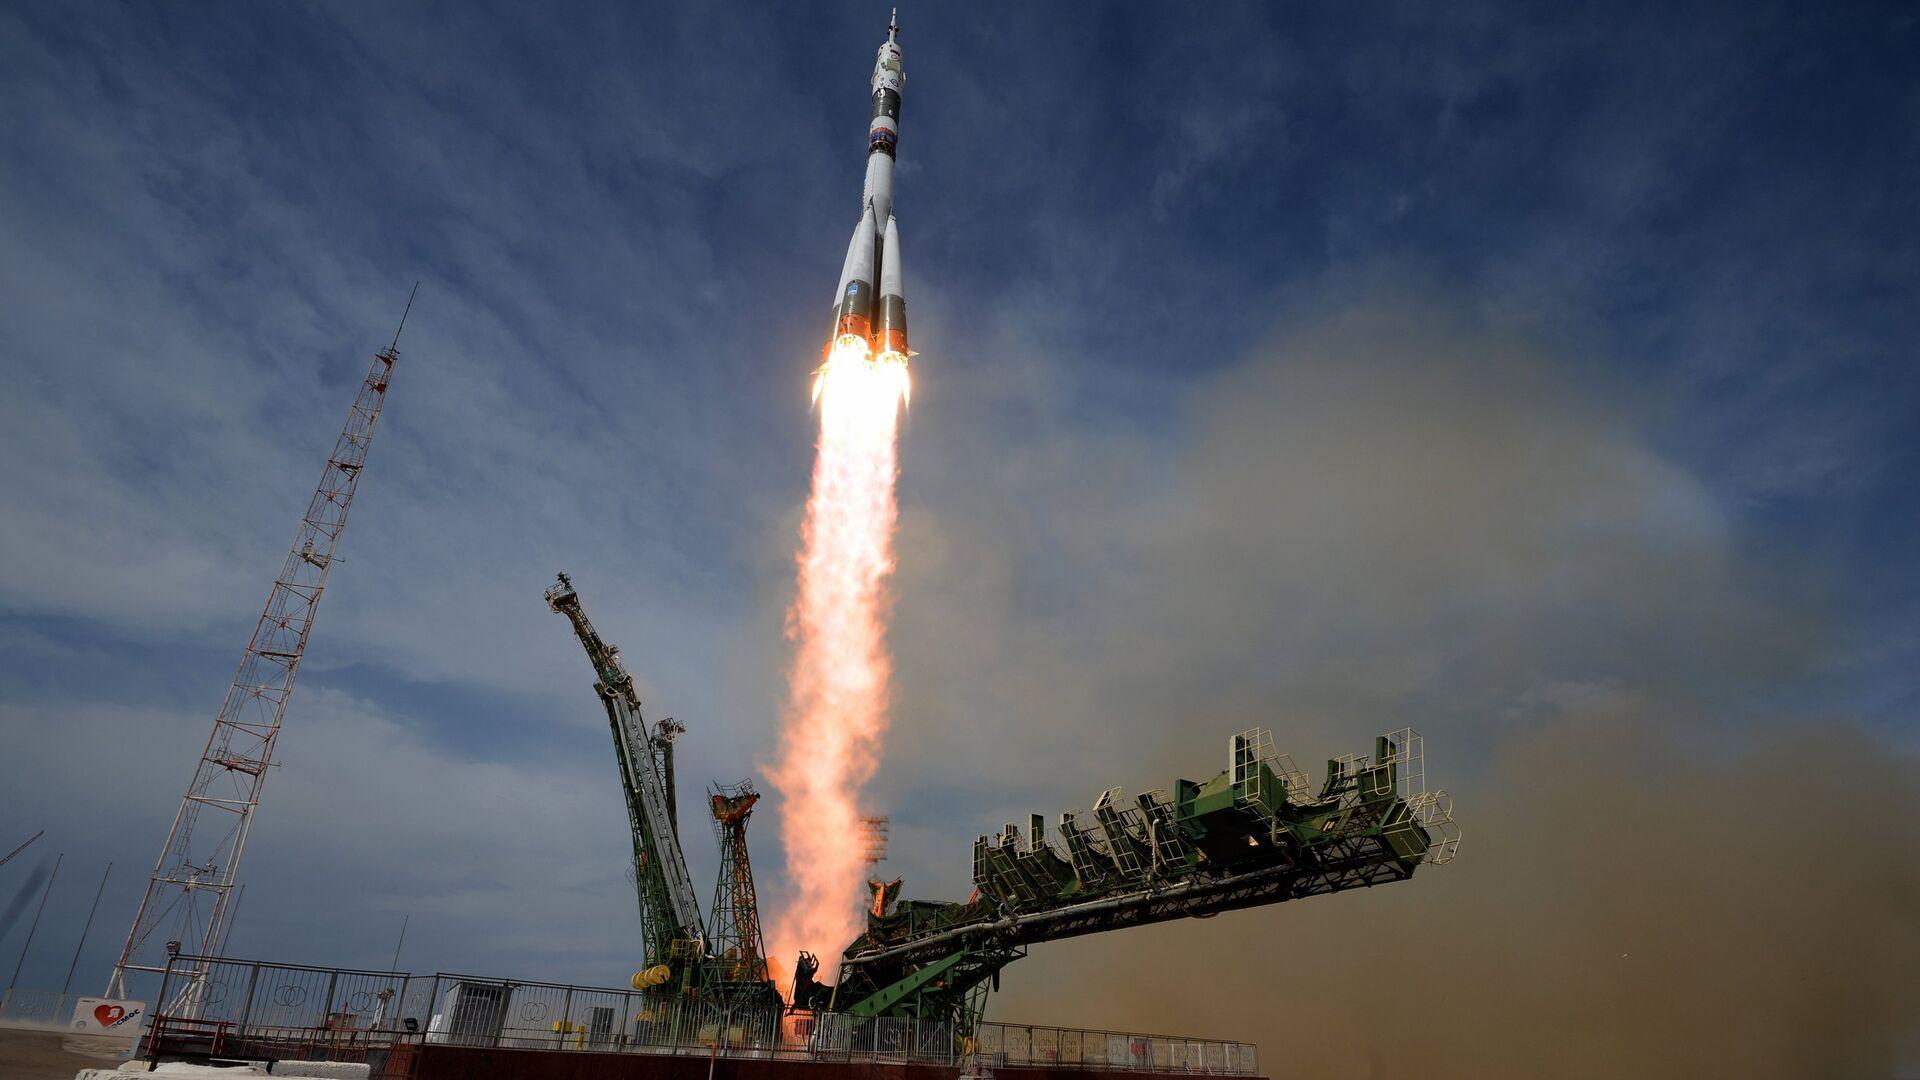 Lanzamiento del cohete Soyuz en el cosmódromo Baikonur (archivo) - Sputnik Mundo, 1920, 12.04.2021